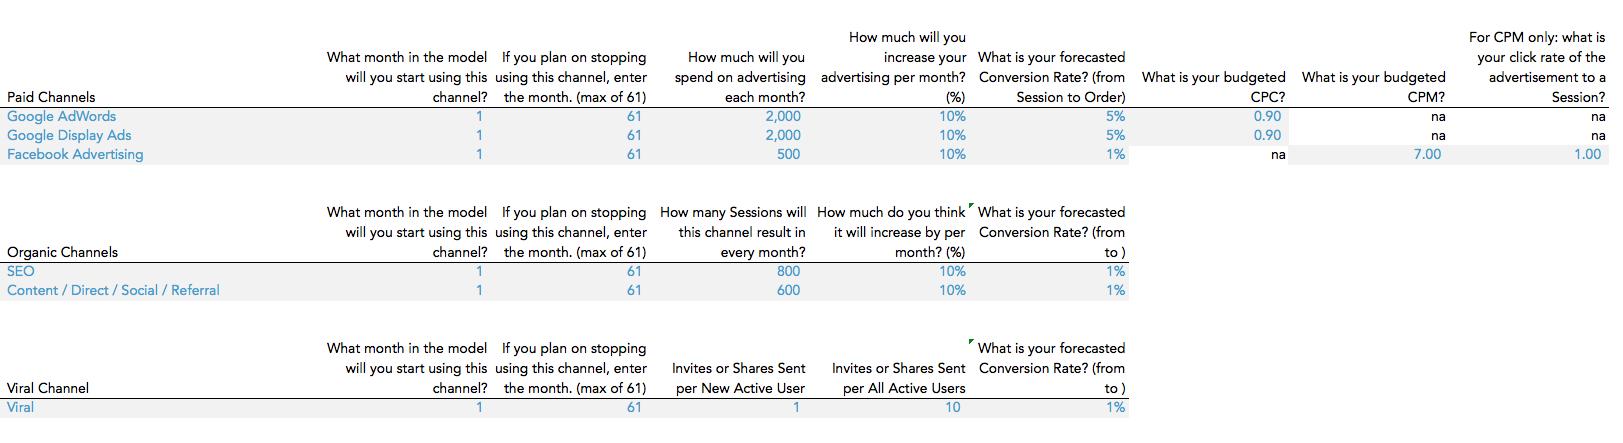 Digital_Marketing_Model_Screenshot_3.png